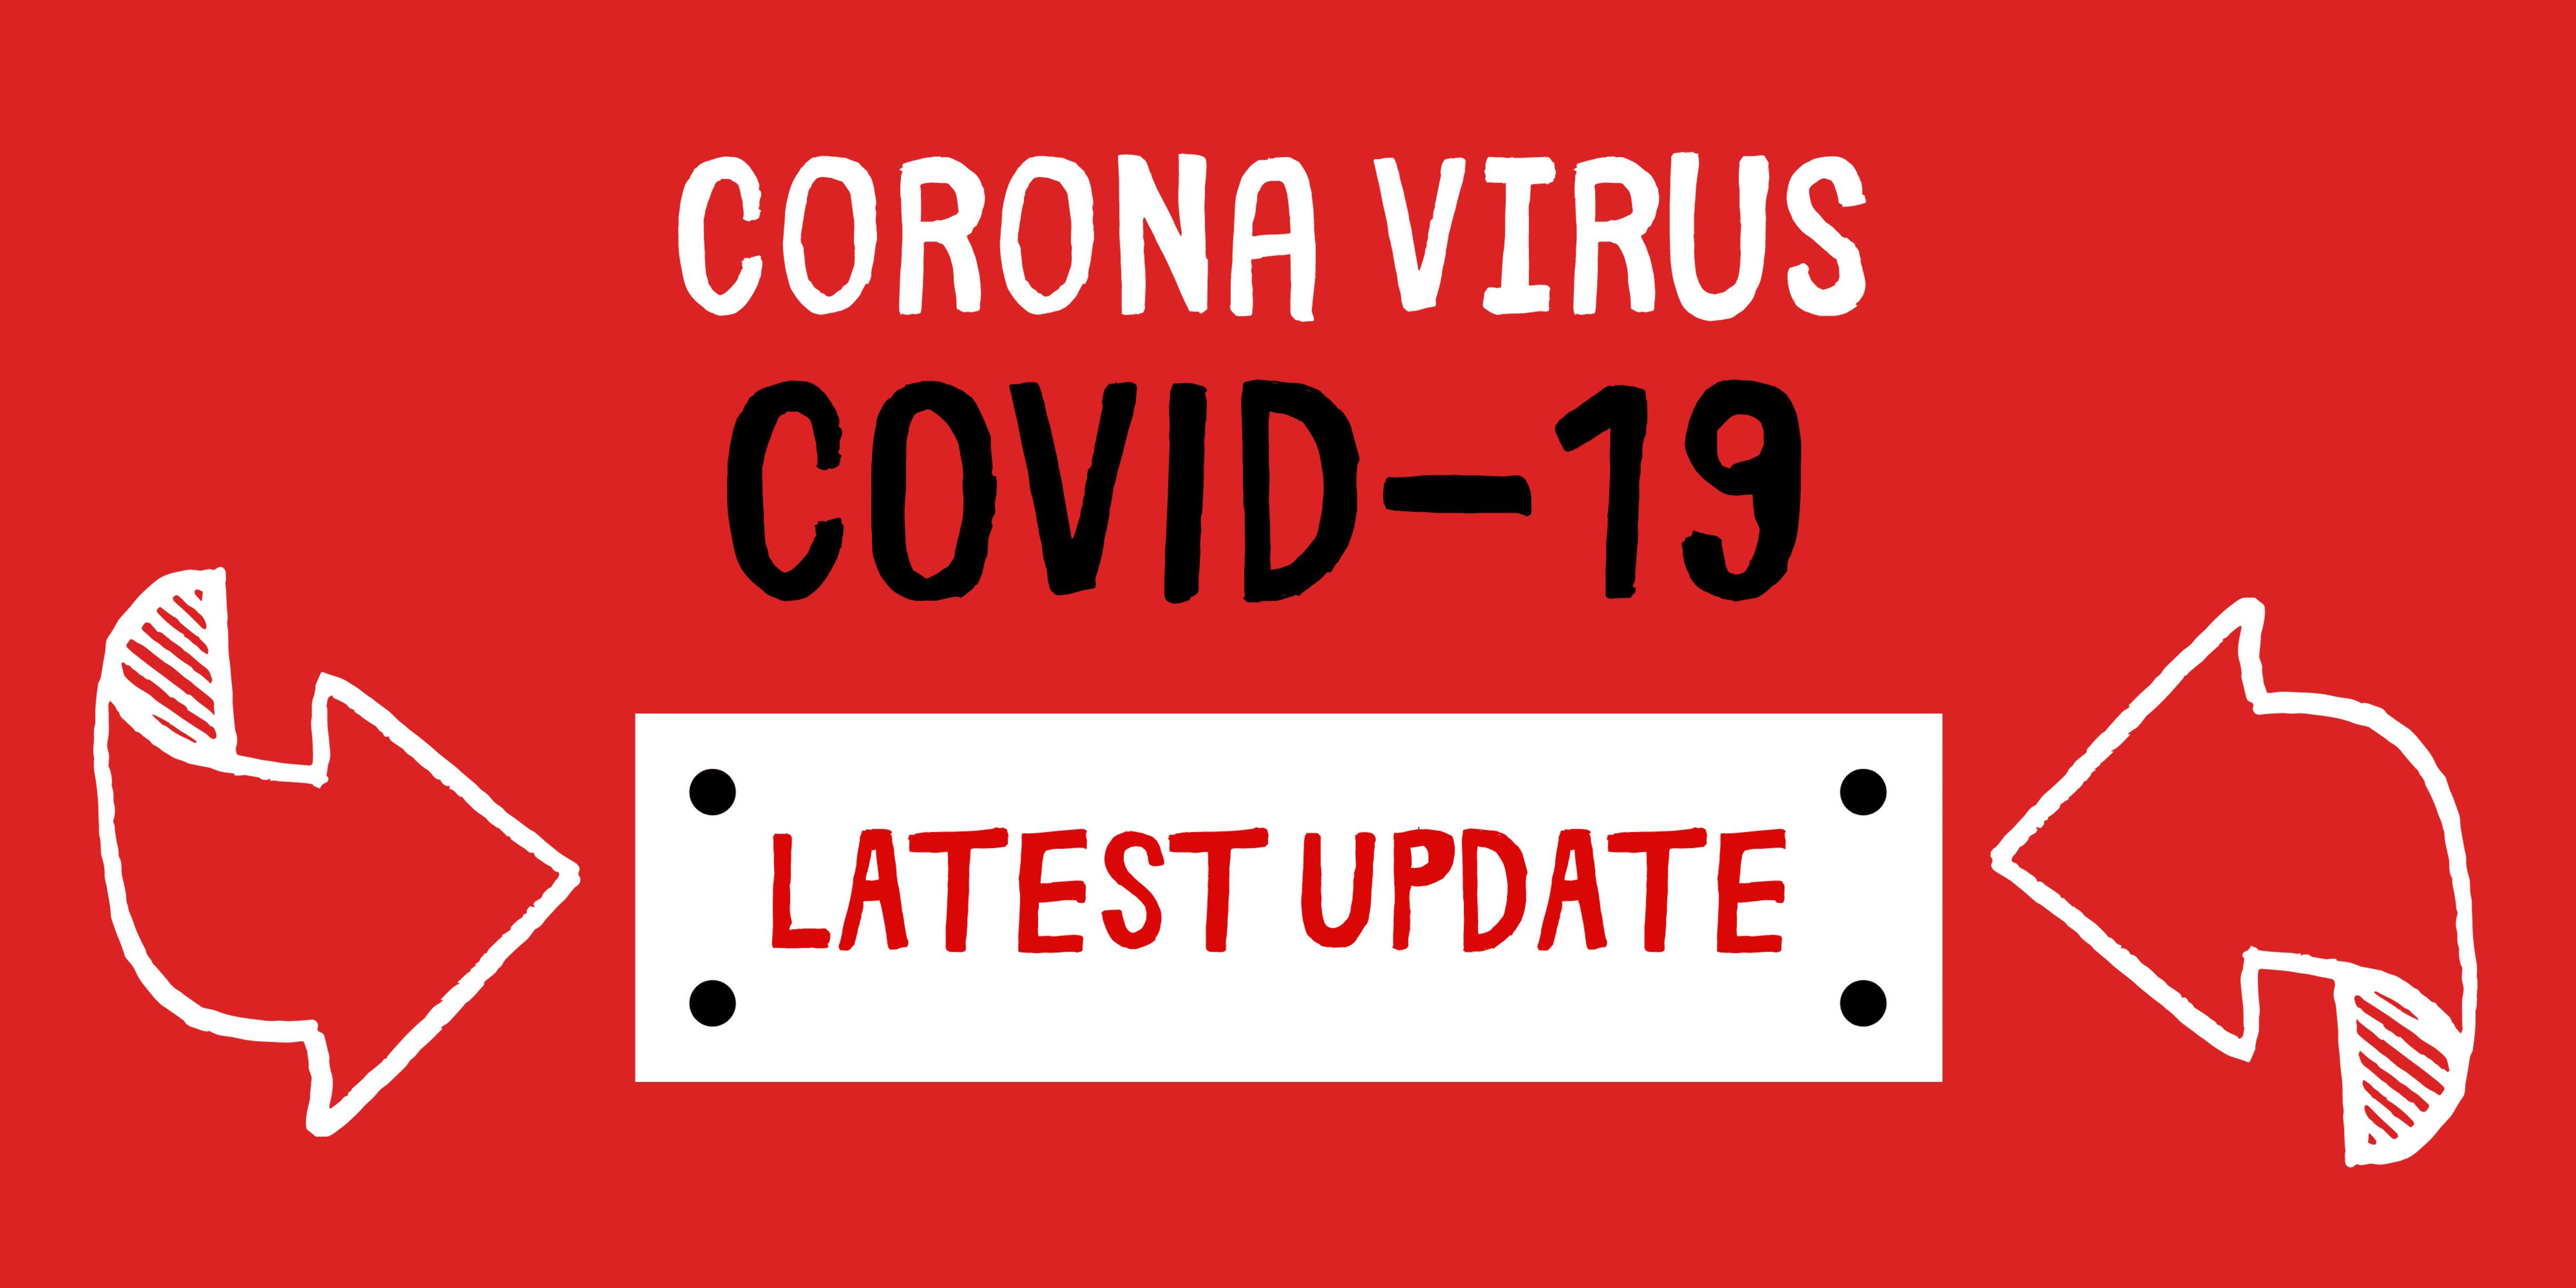 Systemic Effects of COVID-19/Coronavirus